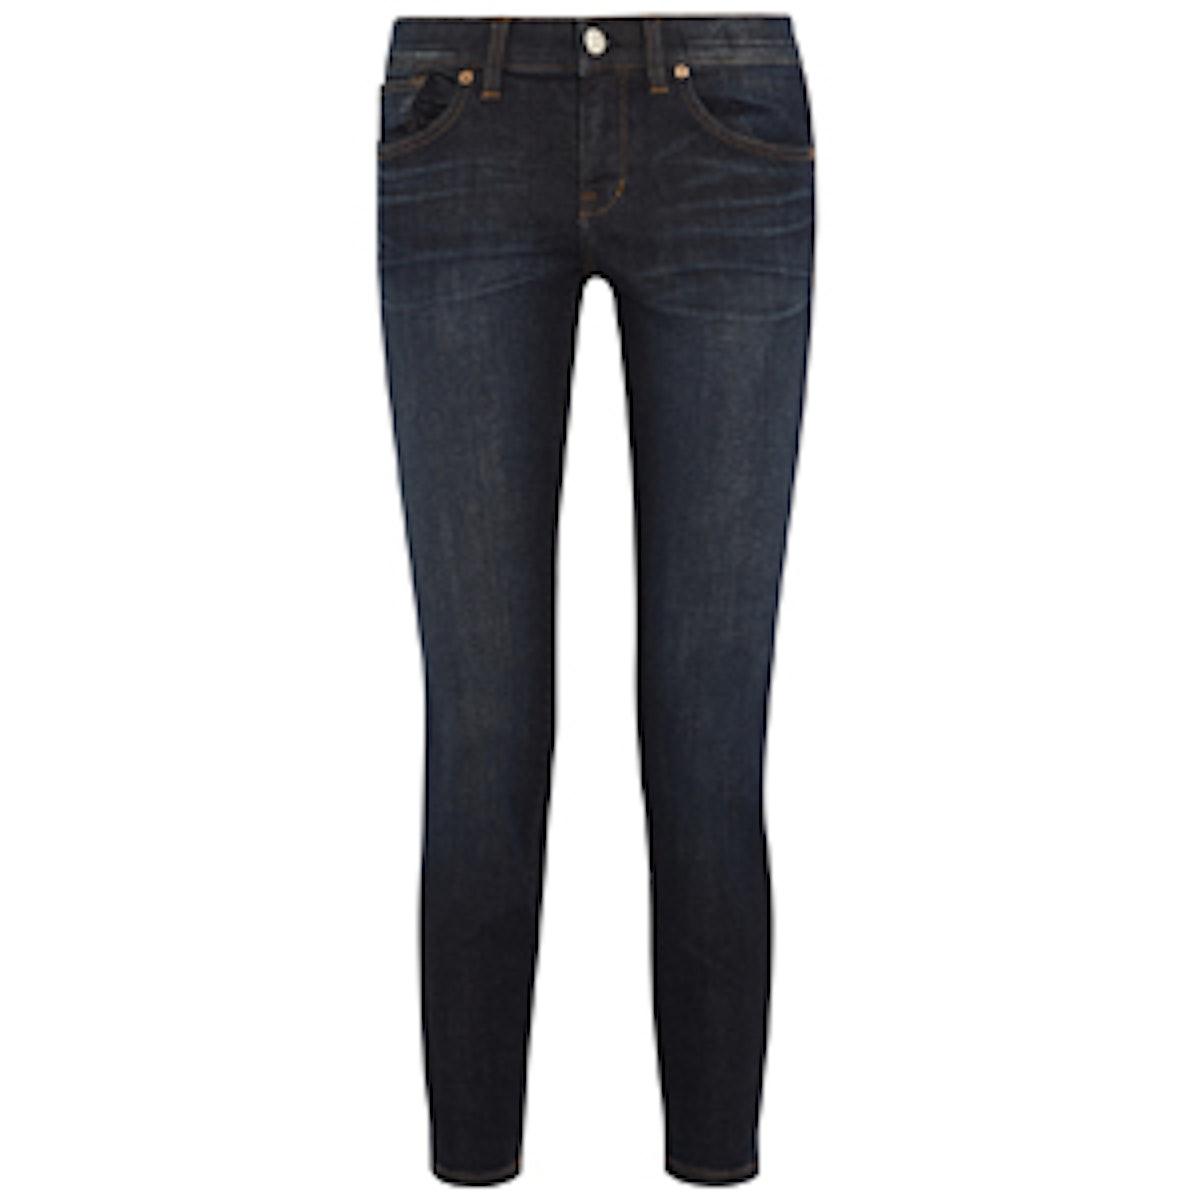 Skinny Midrise Jeans